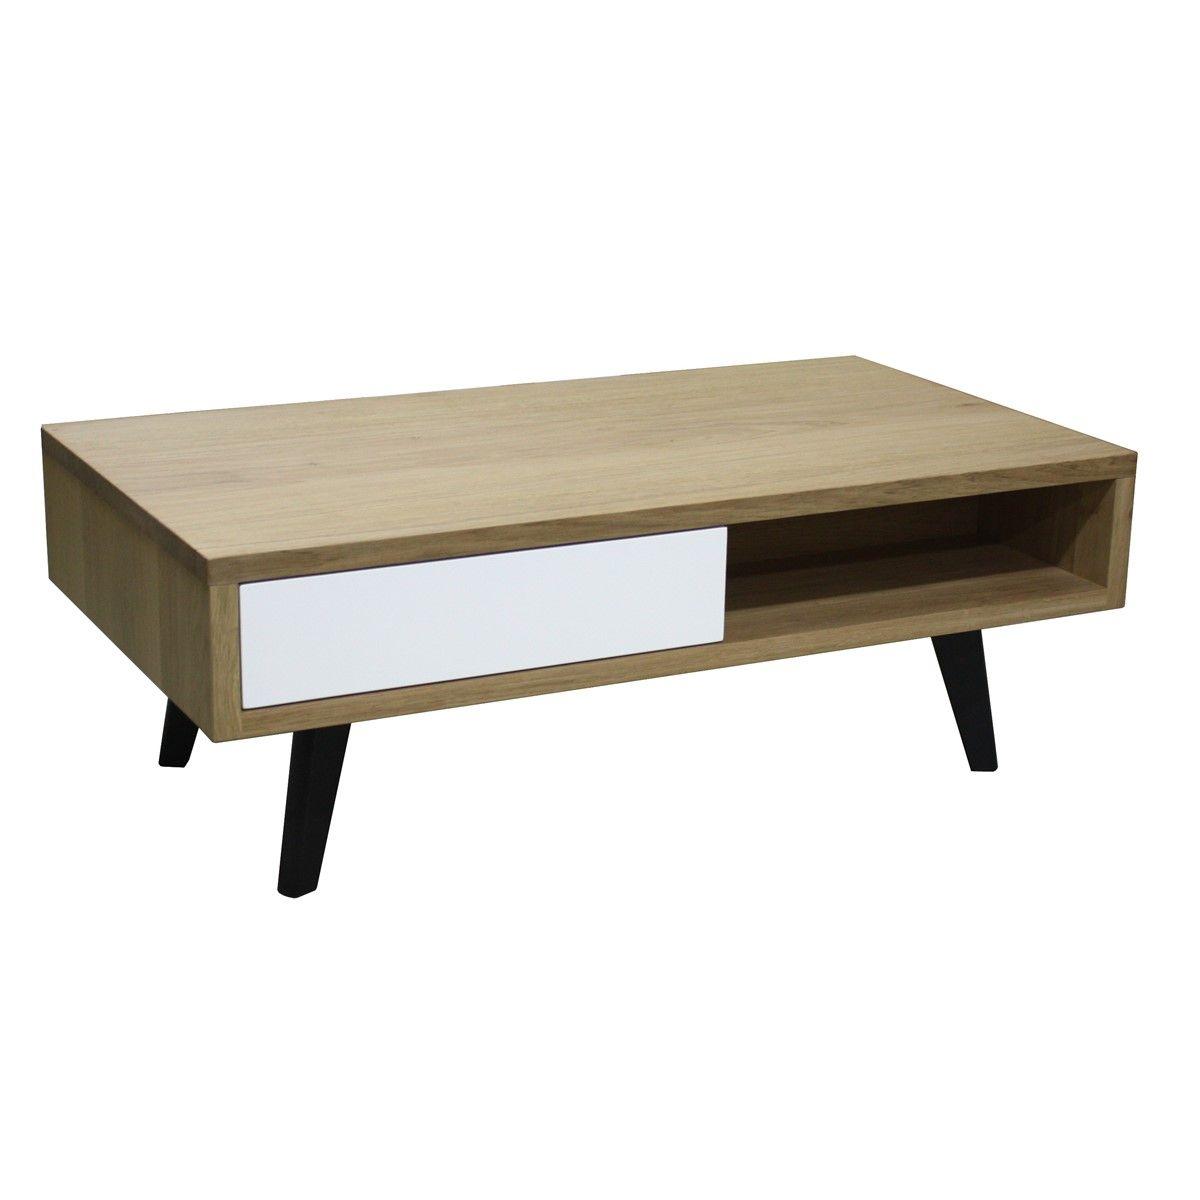 table basse double plateaux en metal hiba. Black Bedroom Furniture Sets. Home Design Ideas